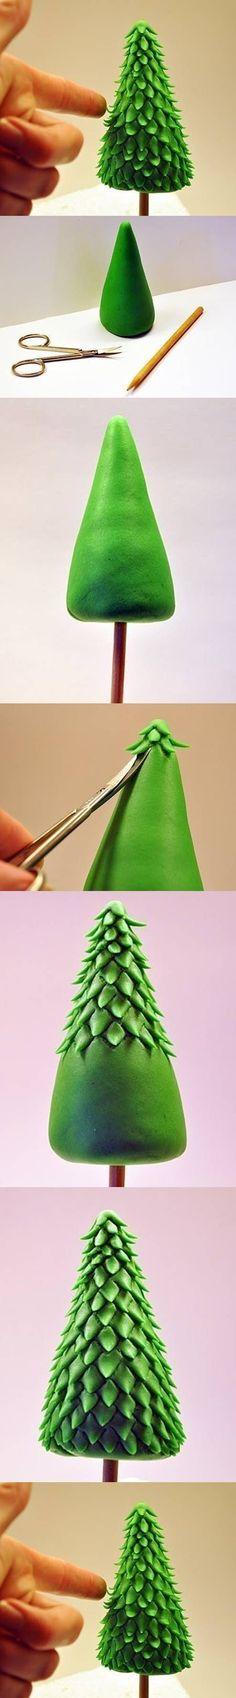 DIY Clay Christmas Tree Internet Tutorial DIY Projects / UsefulDIY.com on imgfave